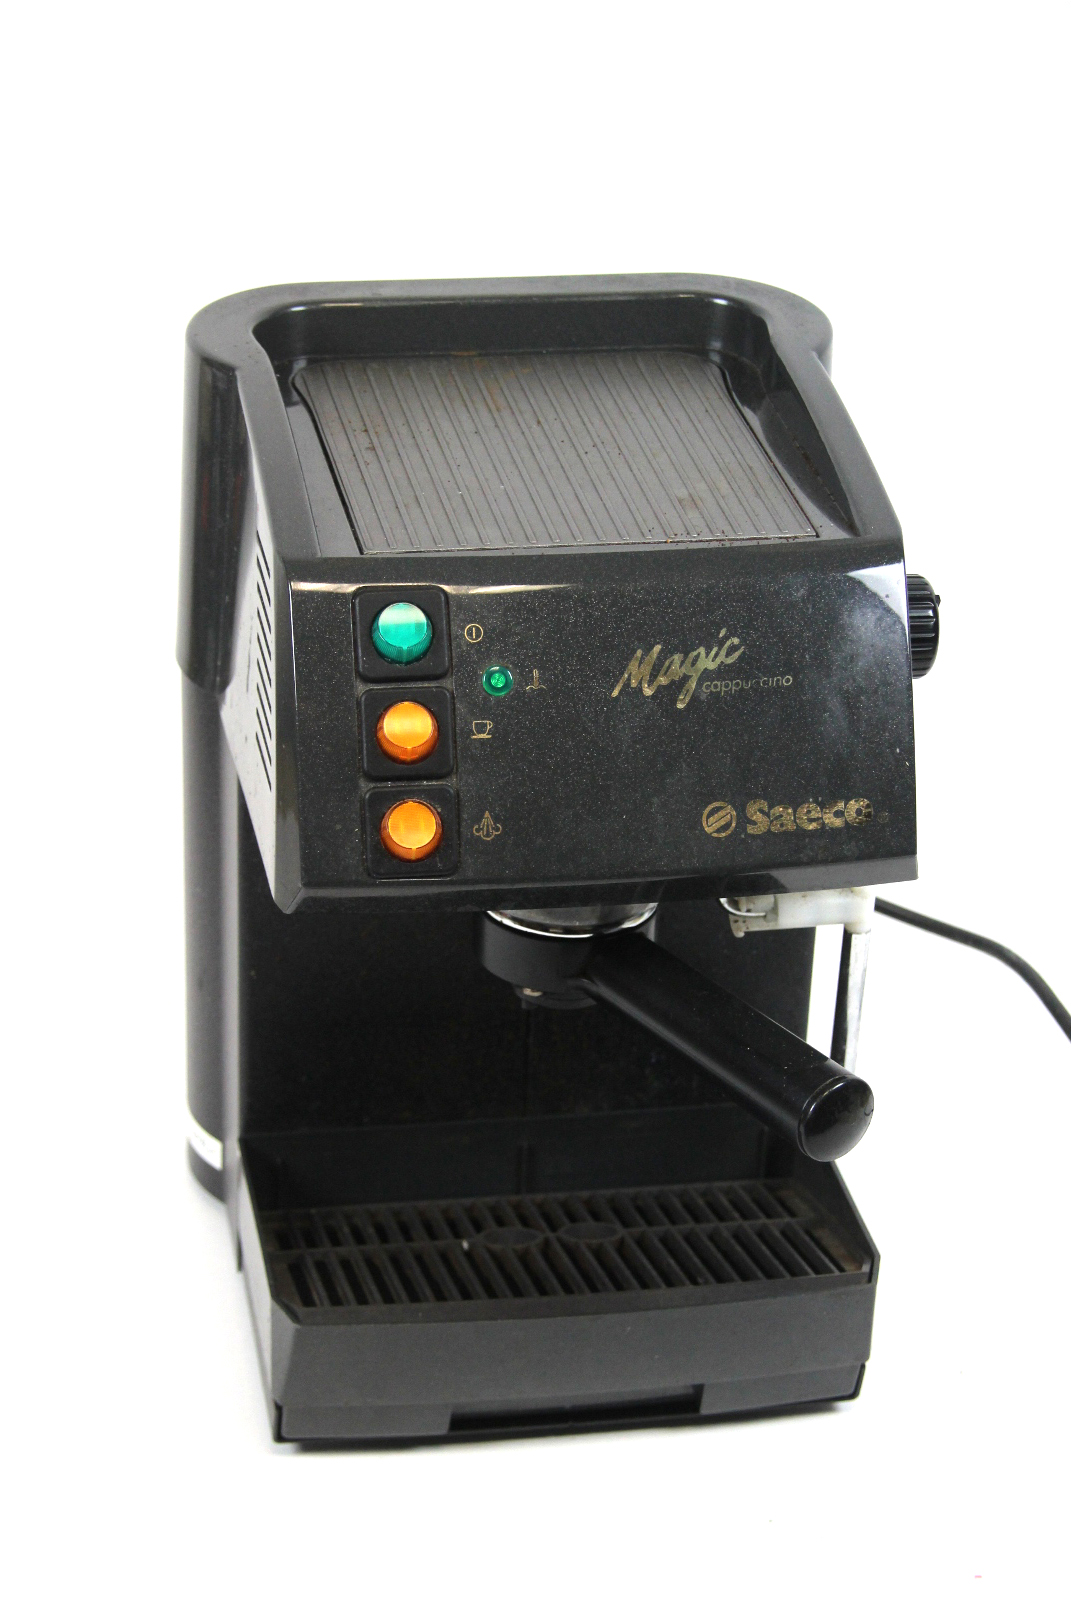 saeco magic cappuccino sin 017 siebtr ger kaffeemaschine espresso kaffee automat ebay. Black Bedroom Furniture Sets. Home Design Ideas